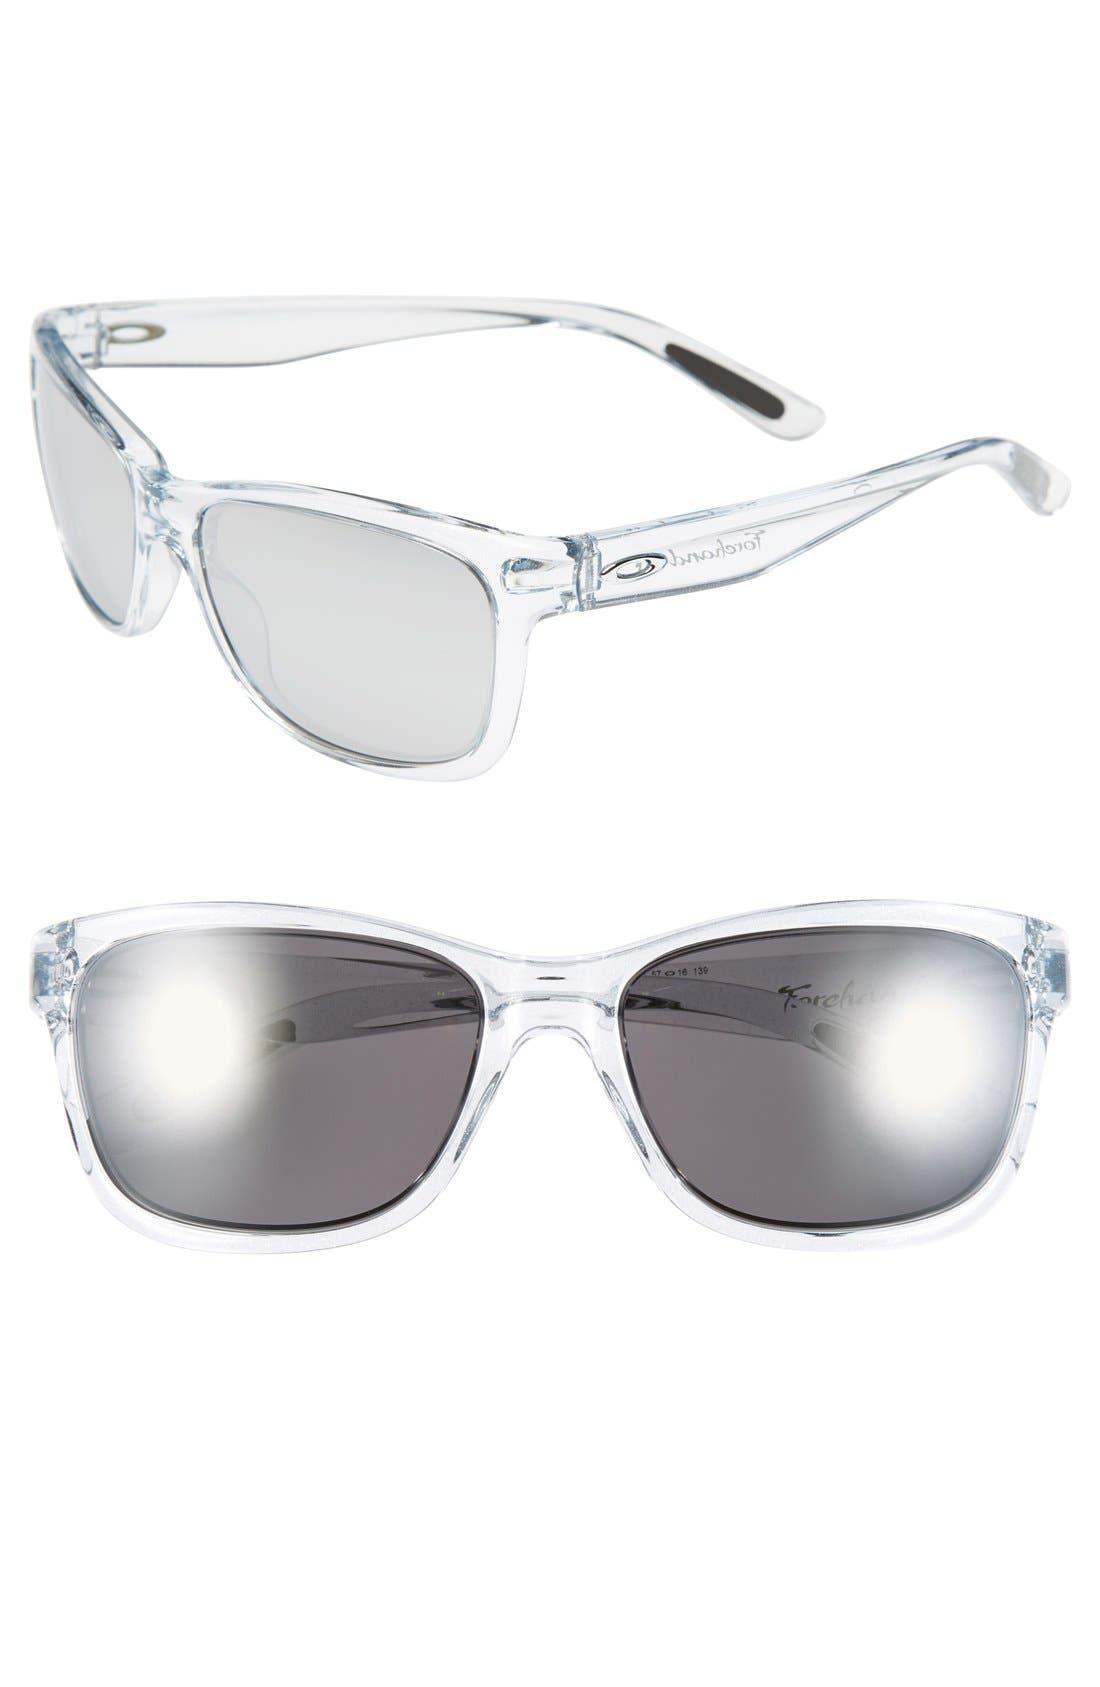 Alternate Image 1 Selected - Oakley 'Forehand' 57mm Sunglasses